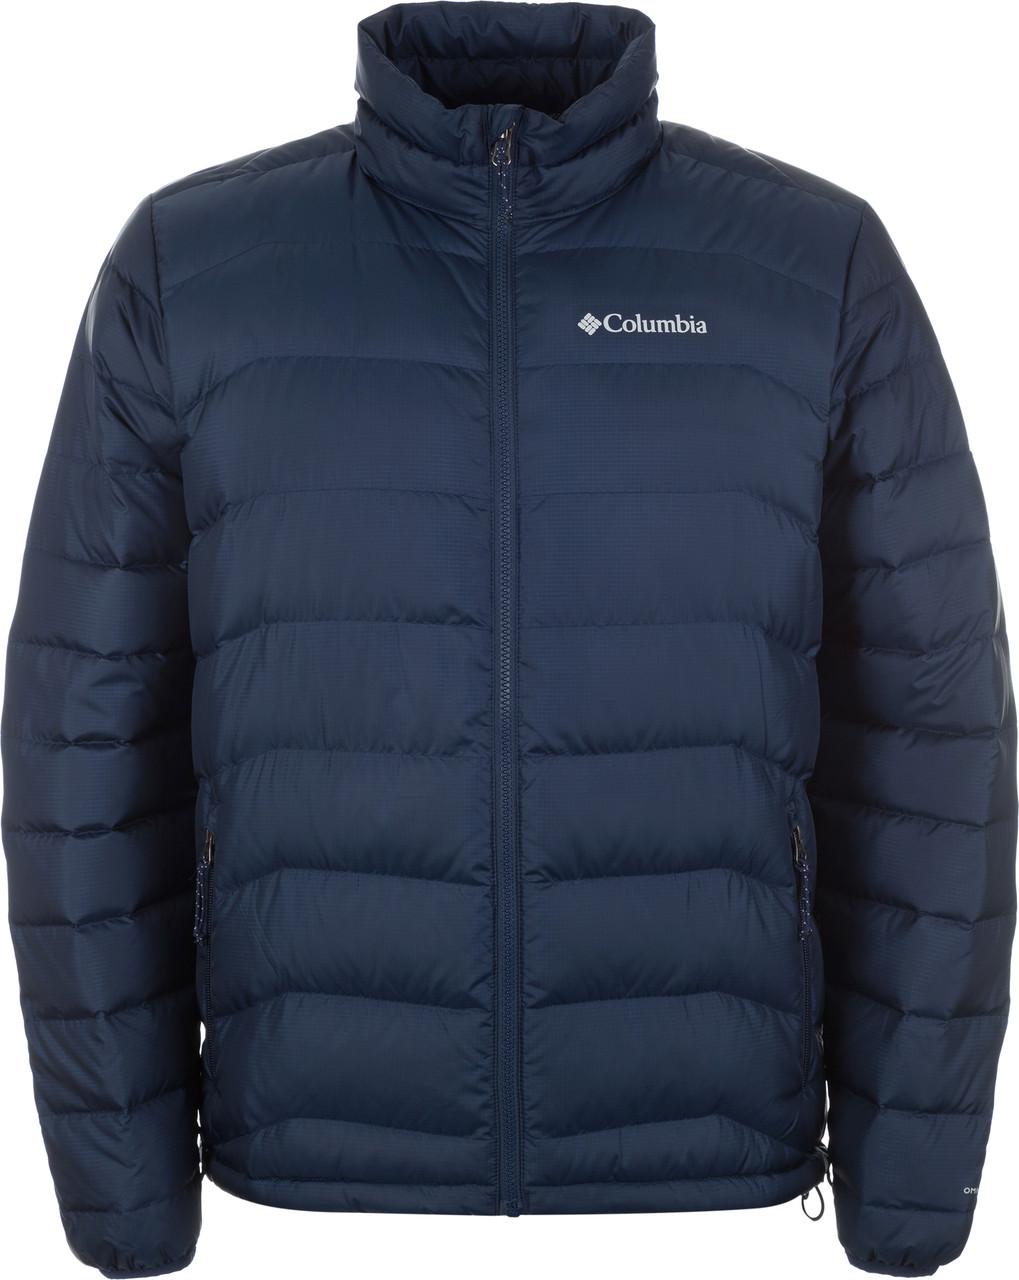 Мужская зимняя синяя куртка Columbia Cascade Peak II Jacket